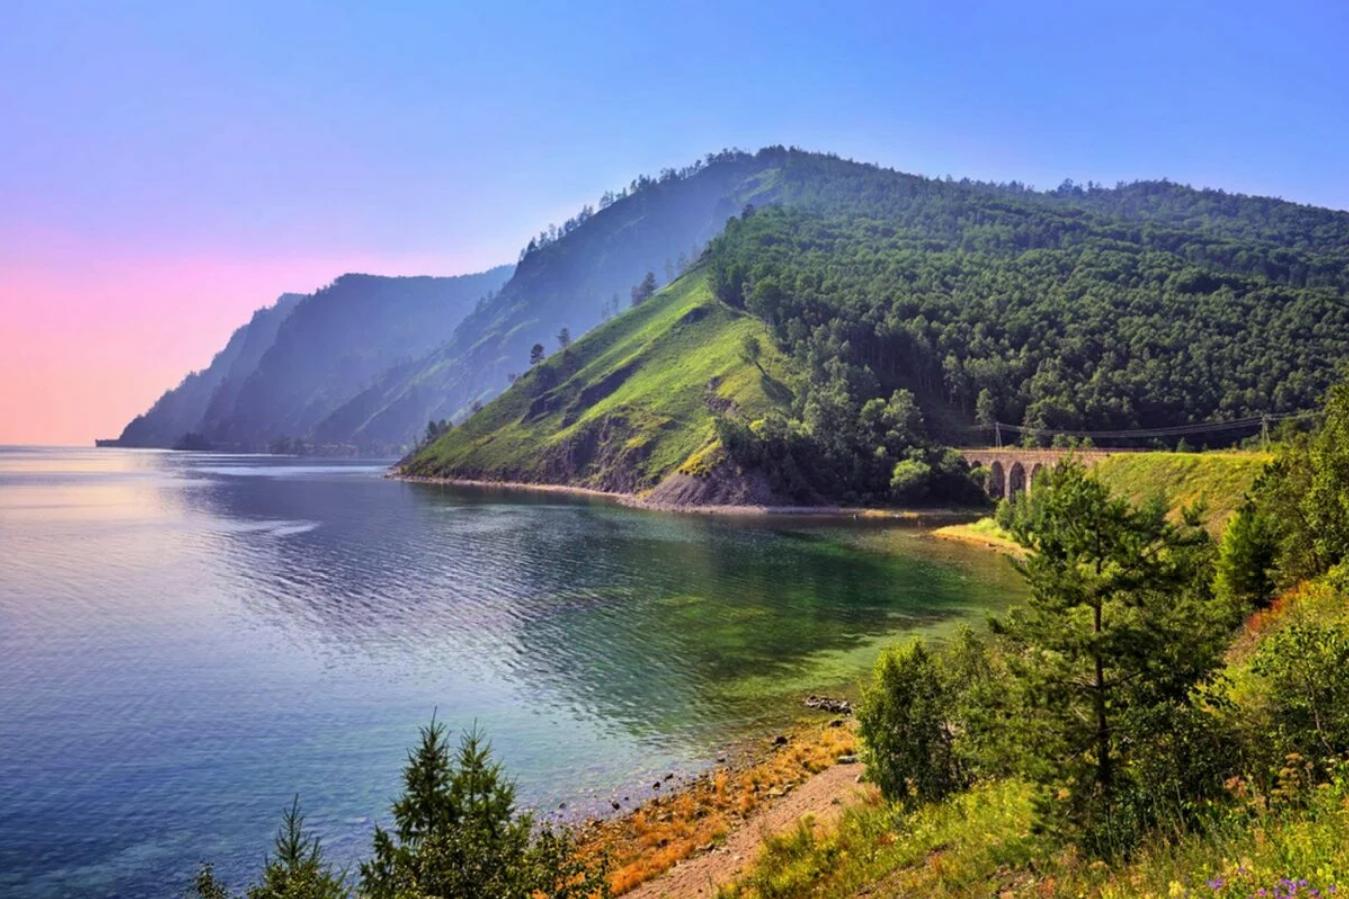 байкал путёвка,байкал поездка,байкал тур цена